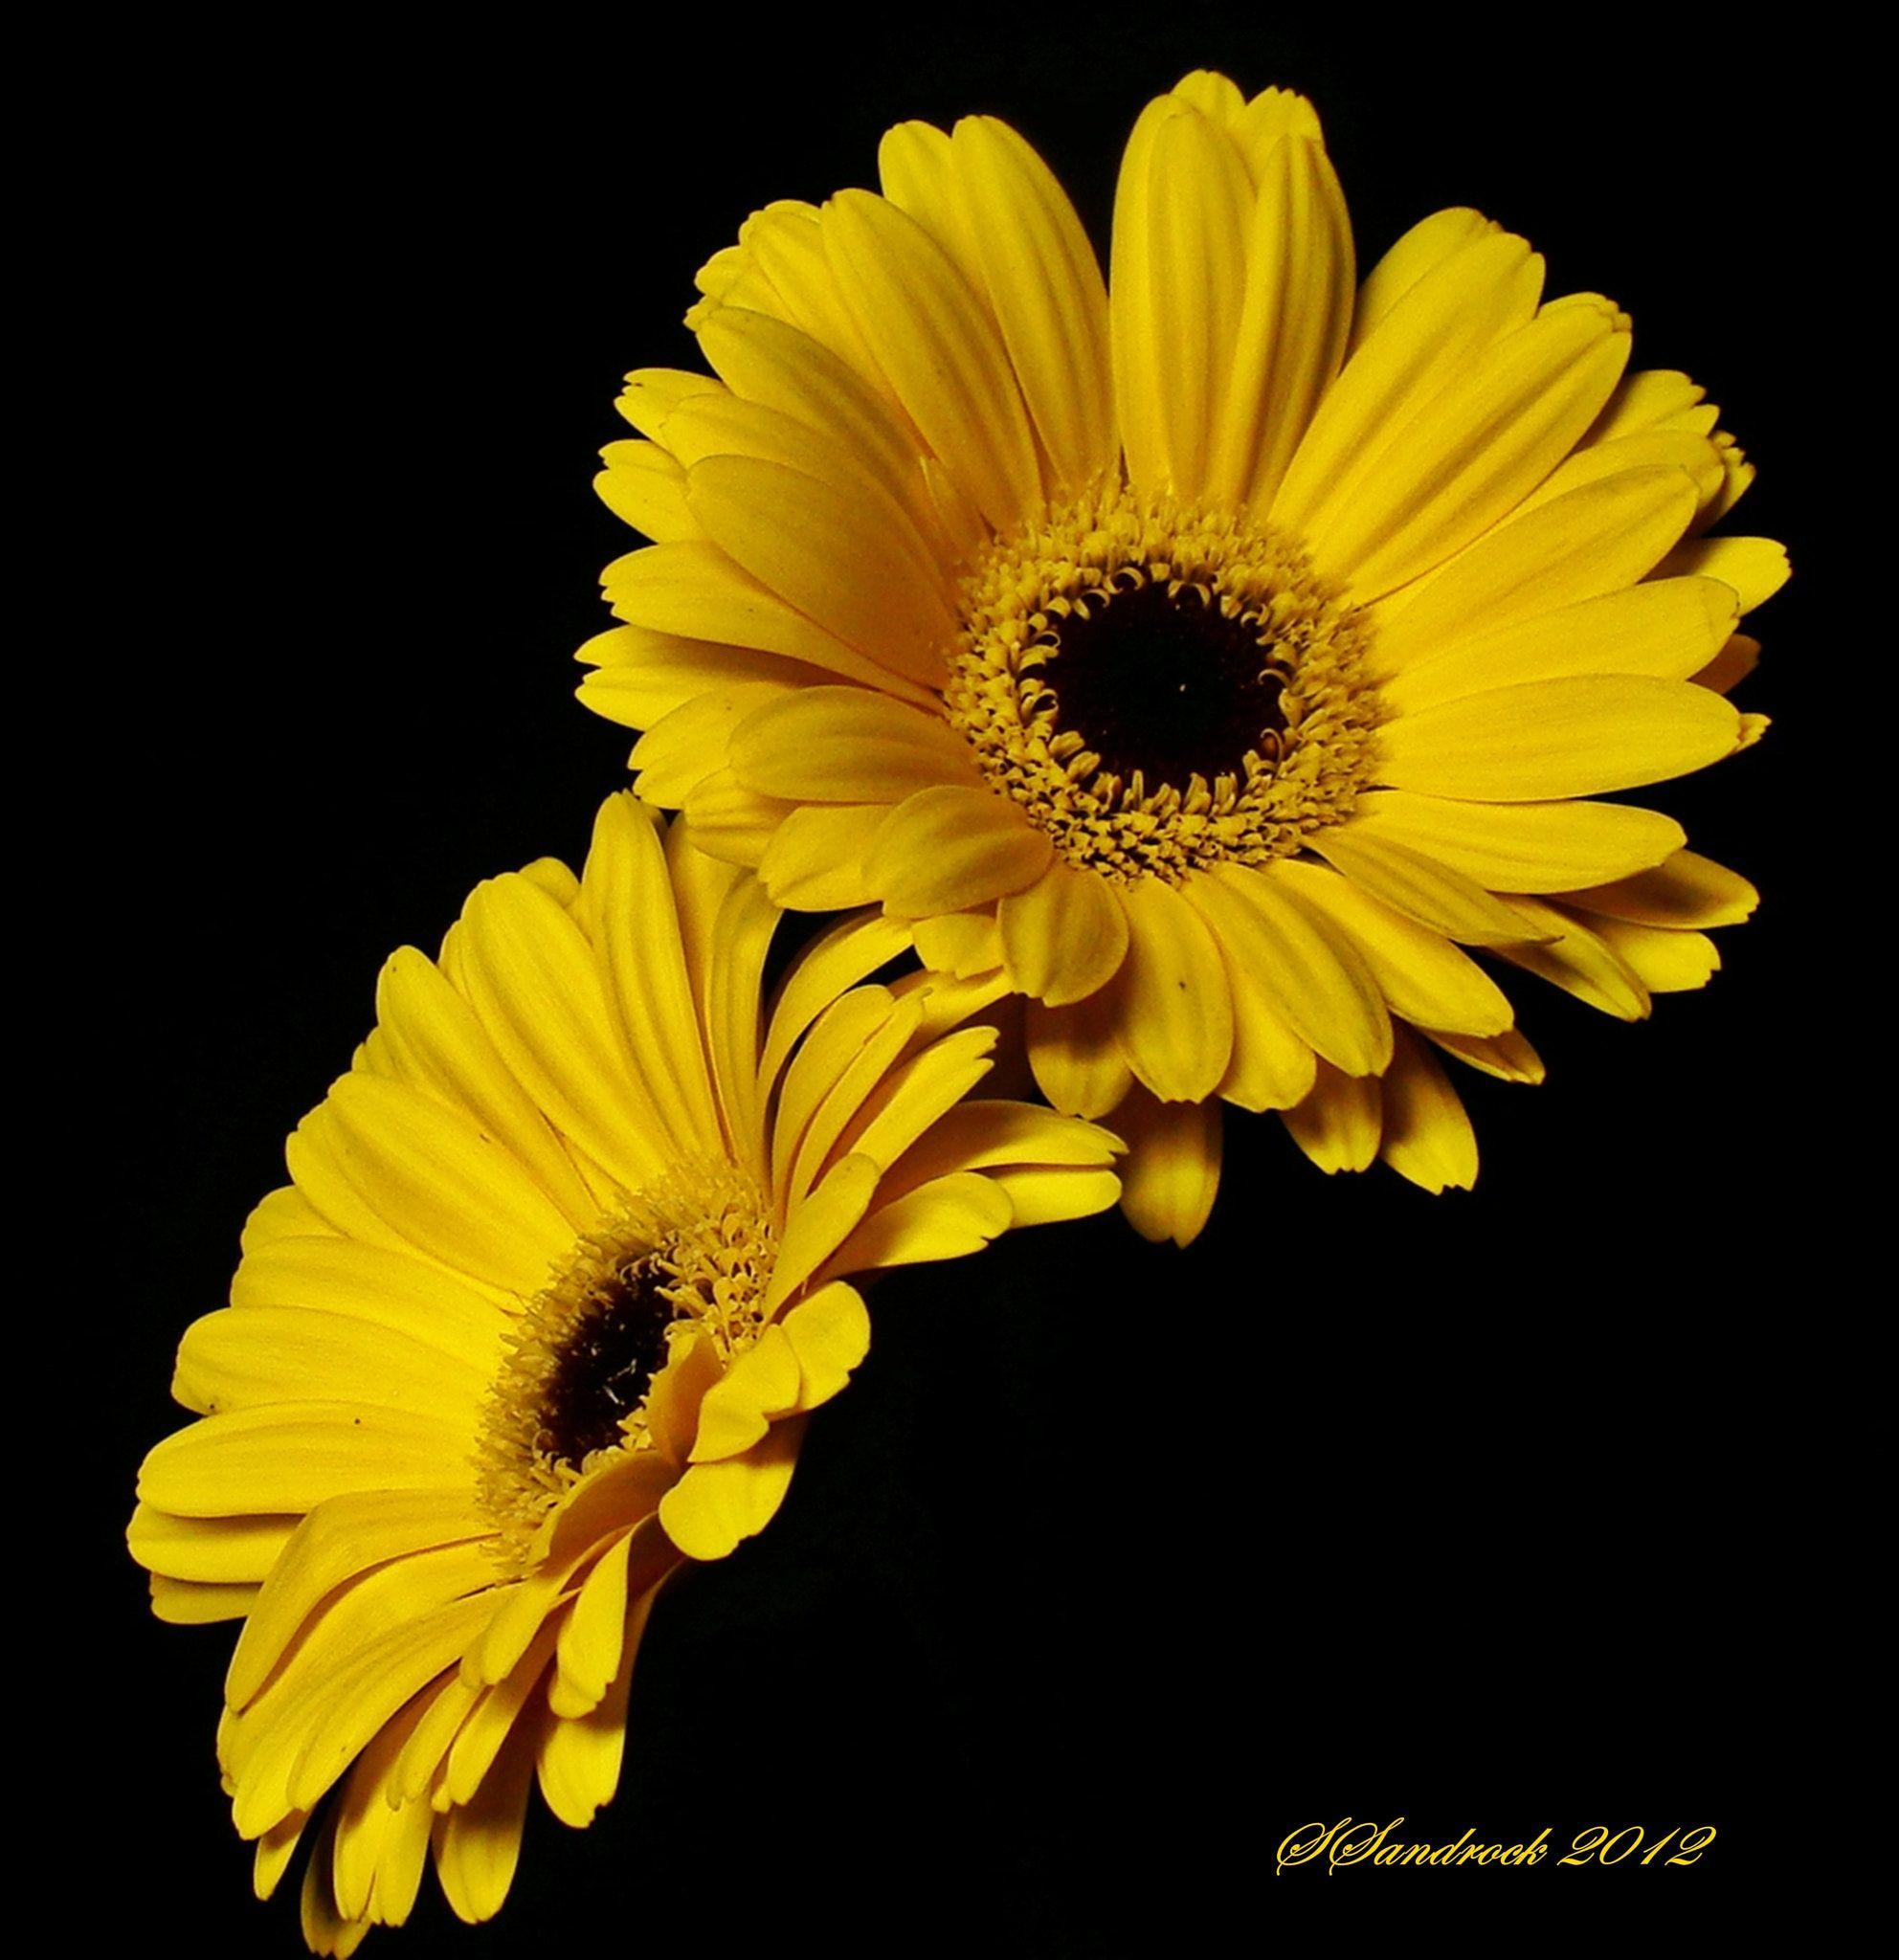 Yellow Gerbera Flower Gerbera Flower Flowers Black Background Gerbera